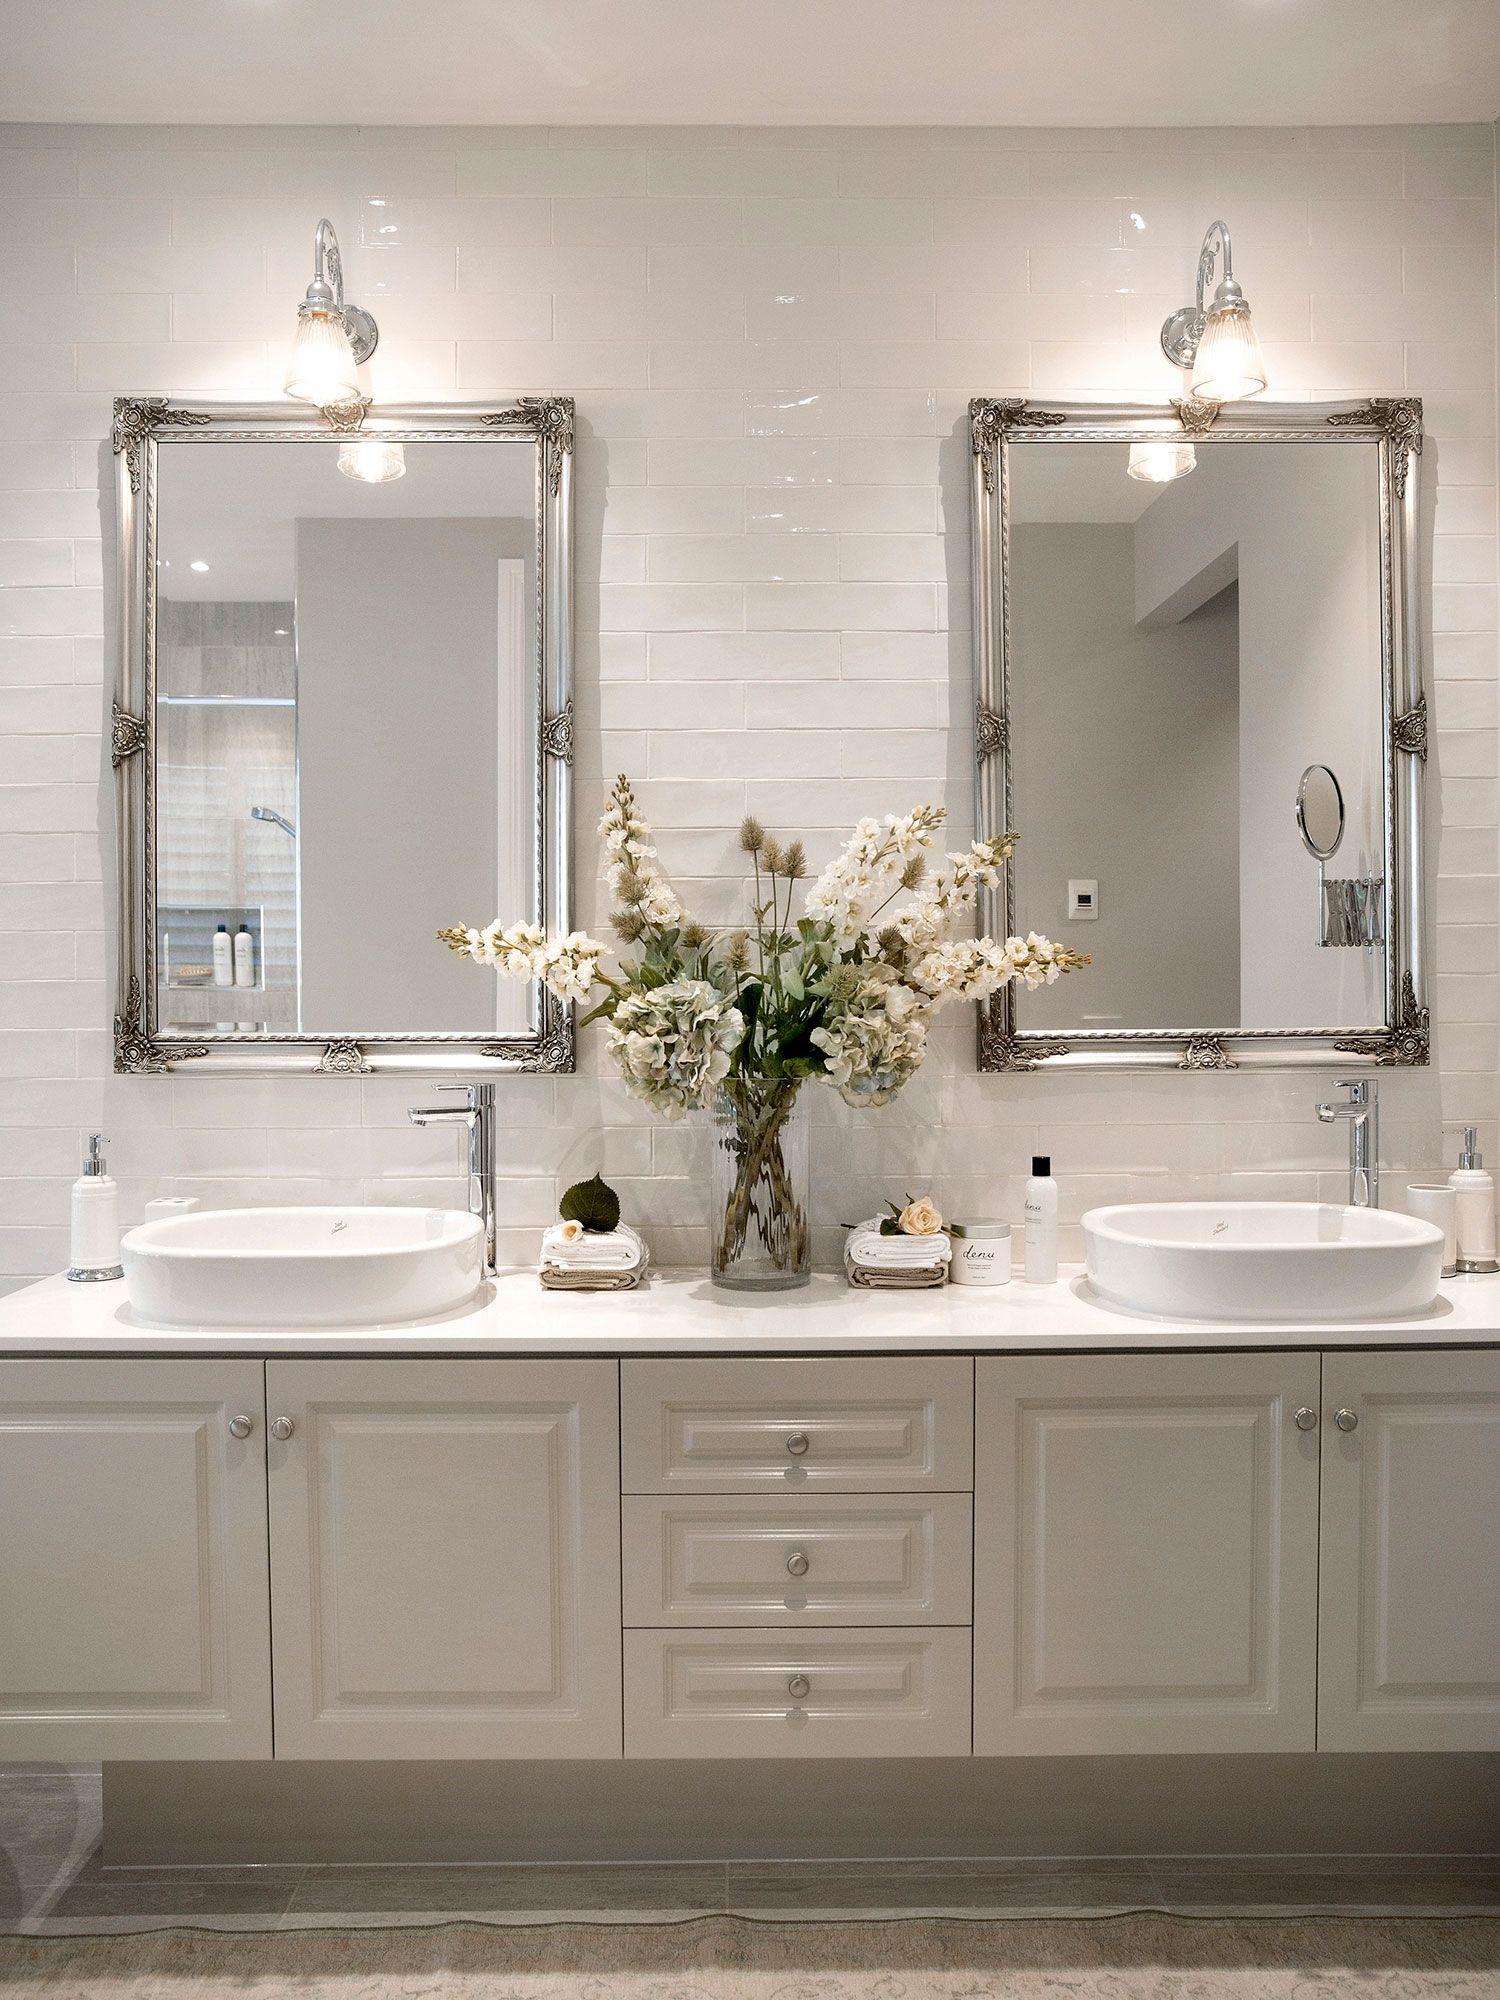 traditional bathroom ideas in 2020 traditional bathroom on bathroom renovation ideas 2020 id=69128